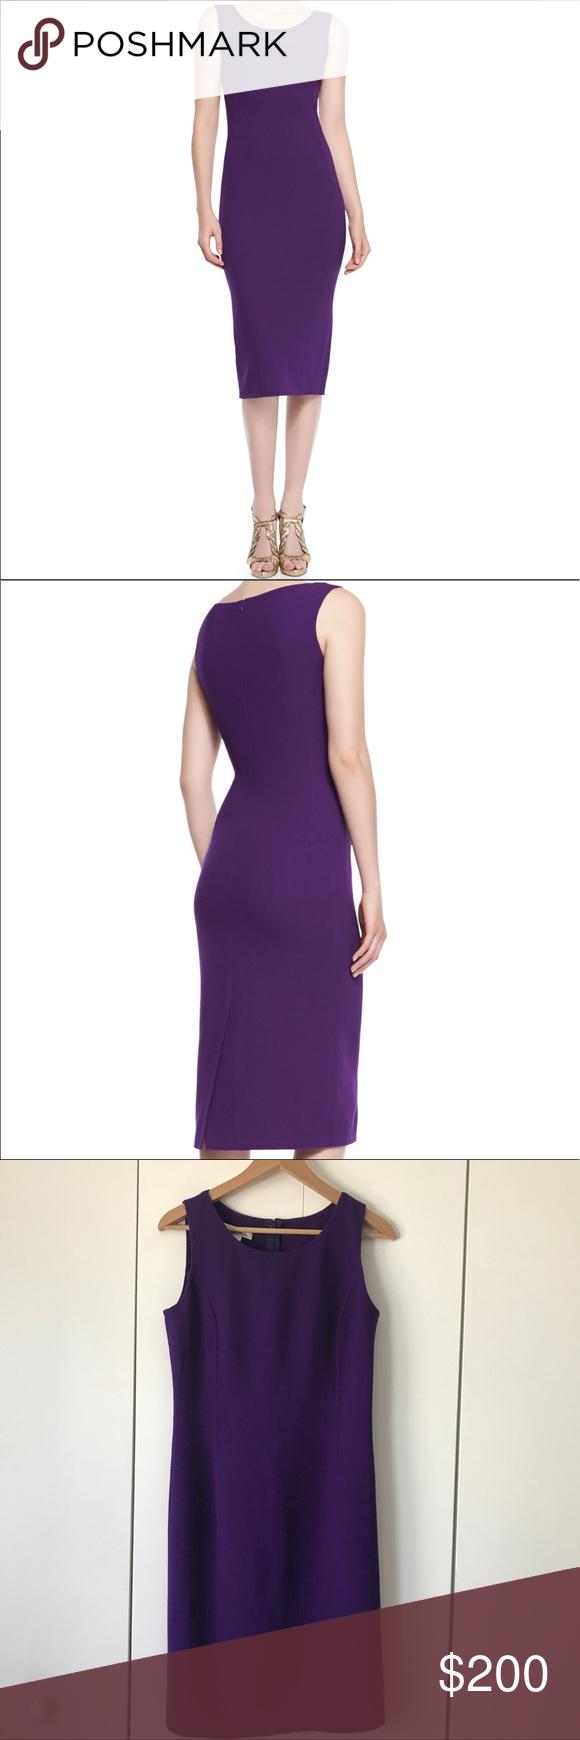 Oscar de la Renta Sleeveless Wool Sheath Dress | Púrpura, Vestidos ...